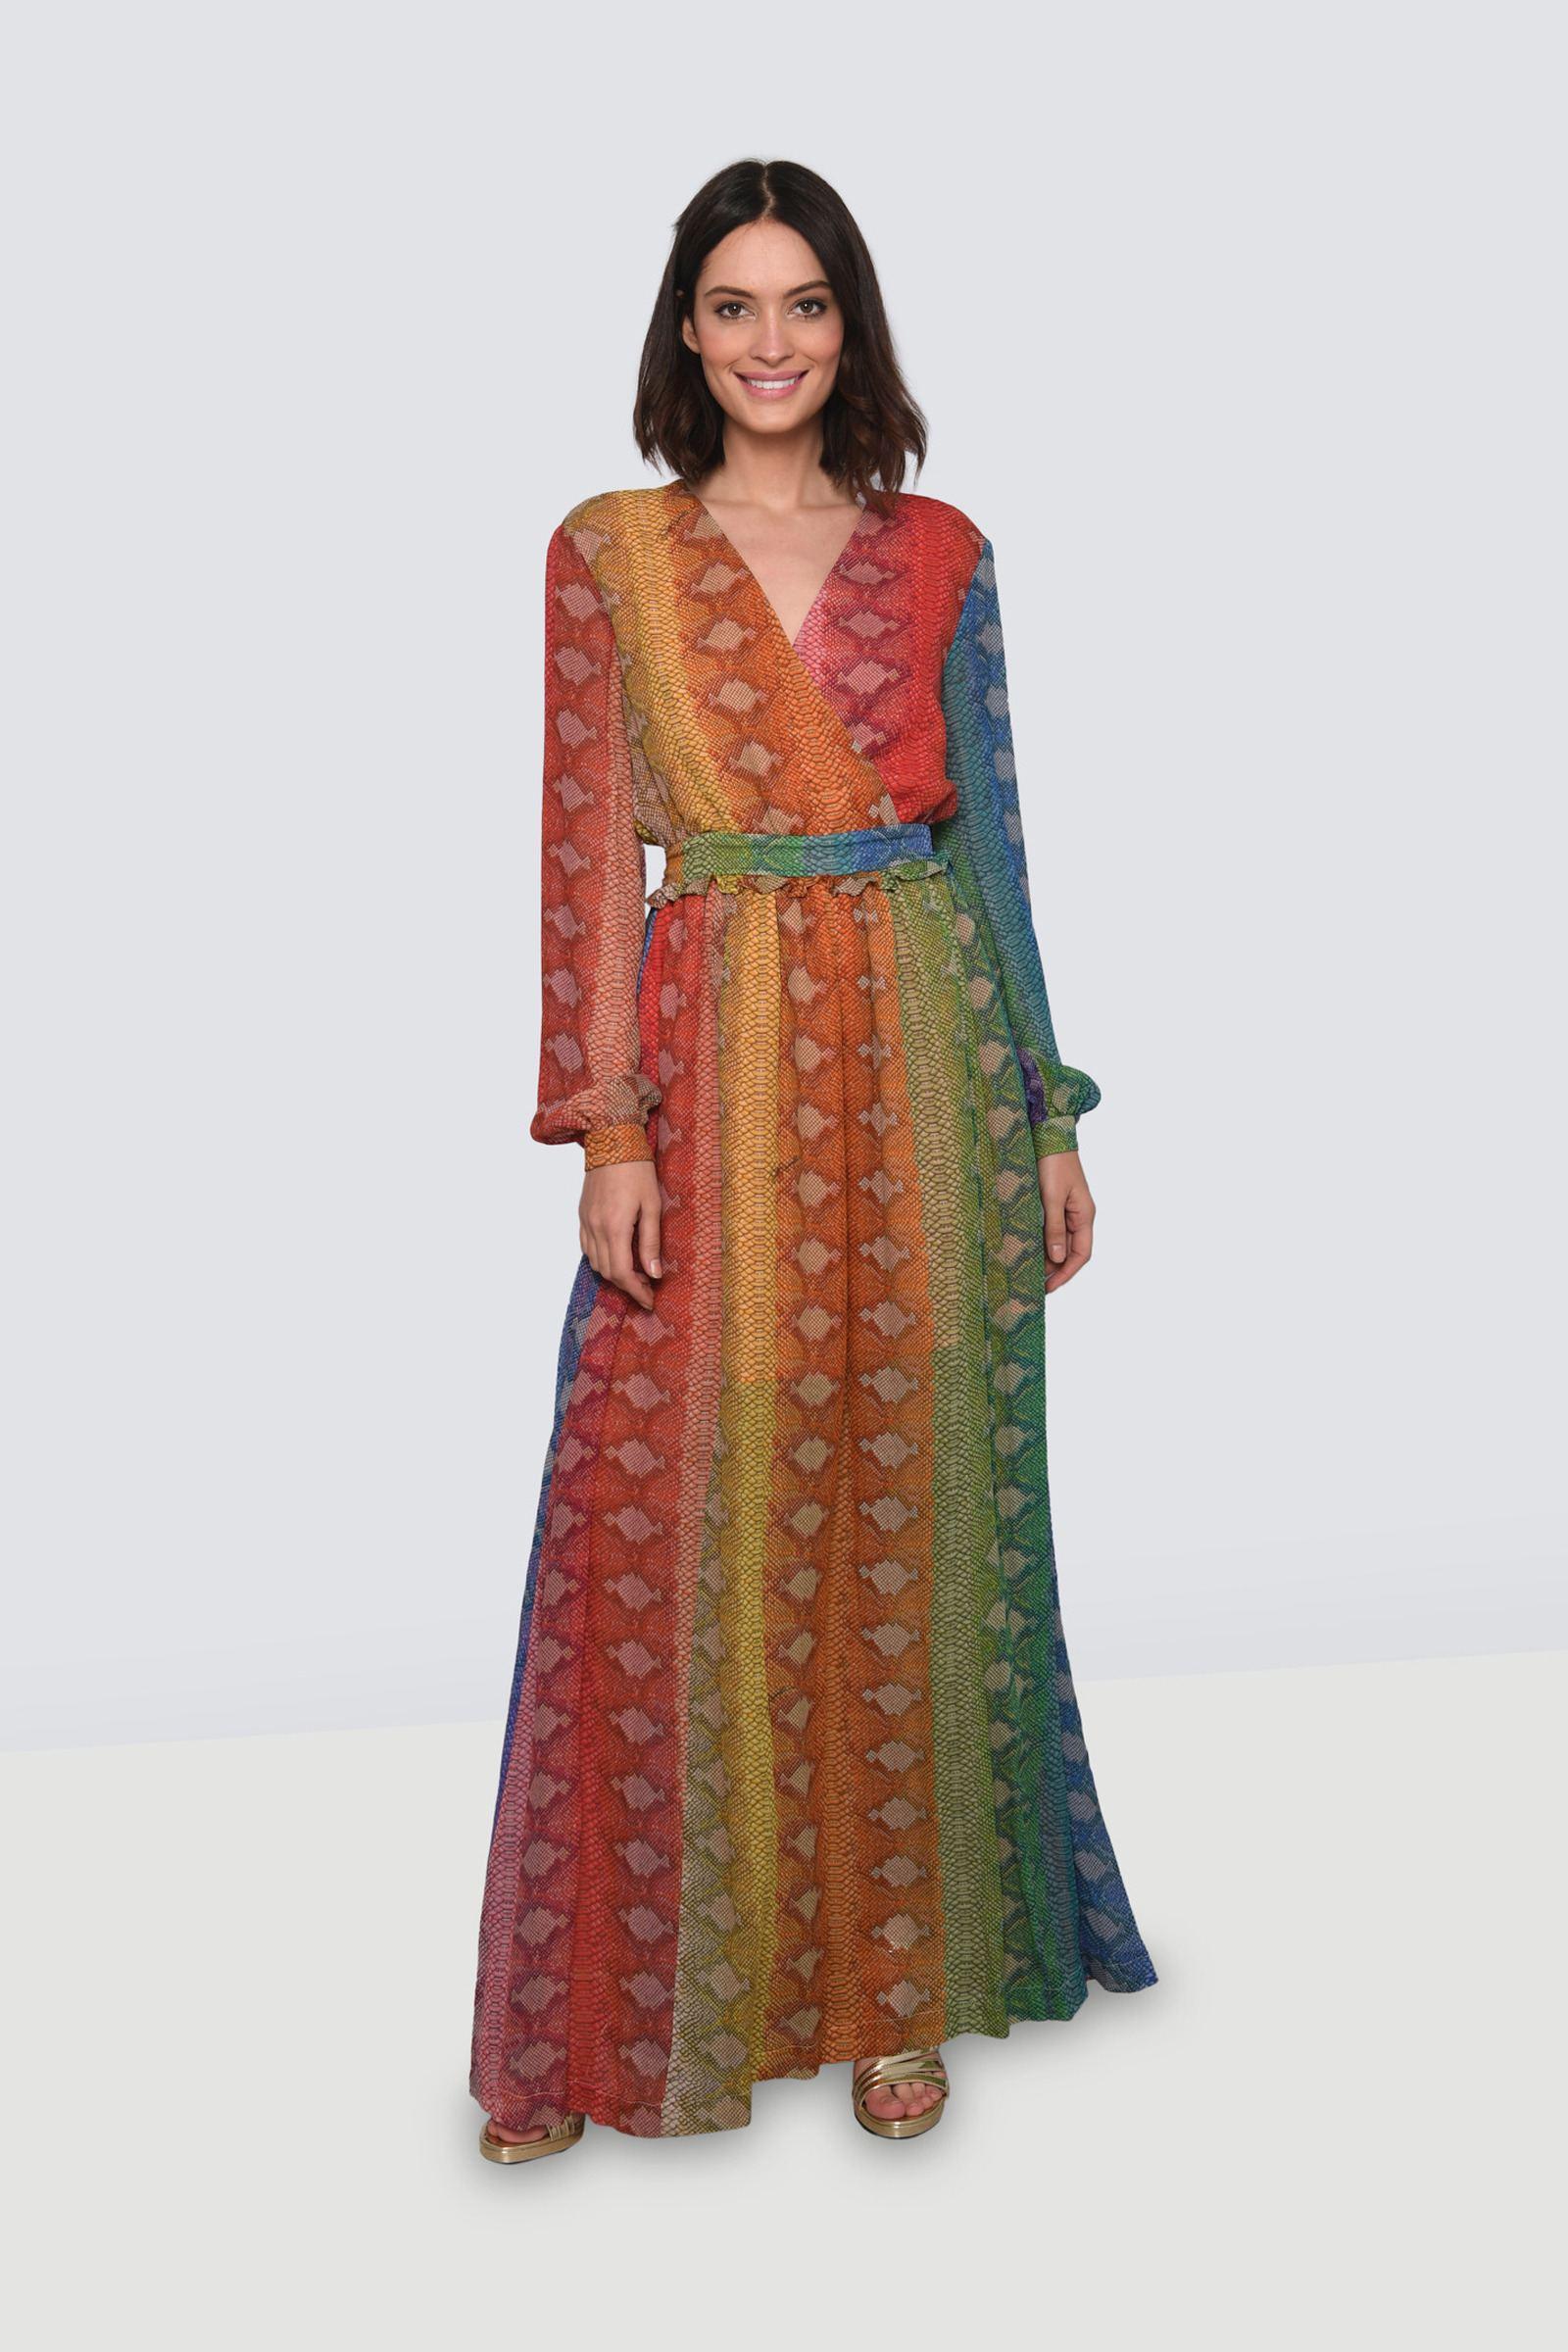 Savilla Silk Crepe de Chine Mini Wrap Dress in Parang Wisteria by DVF